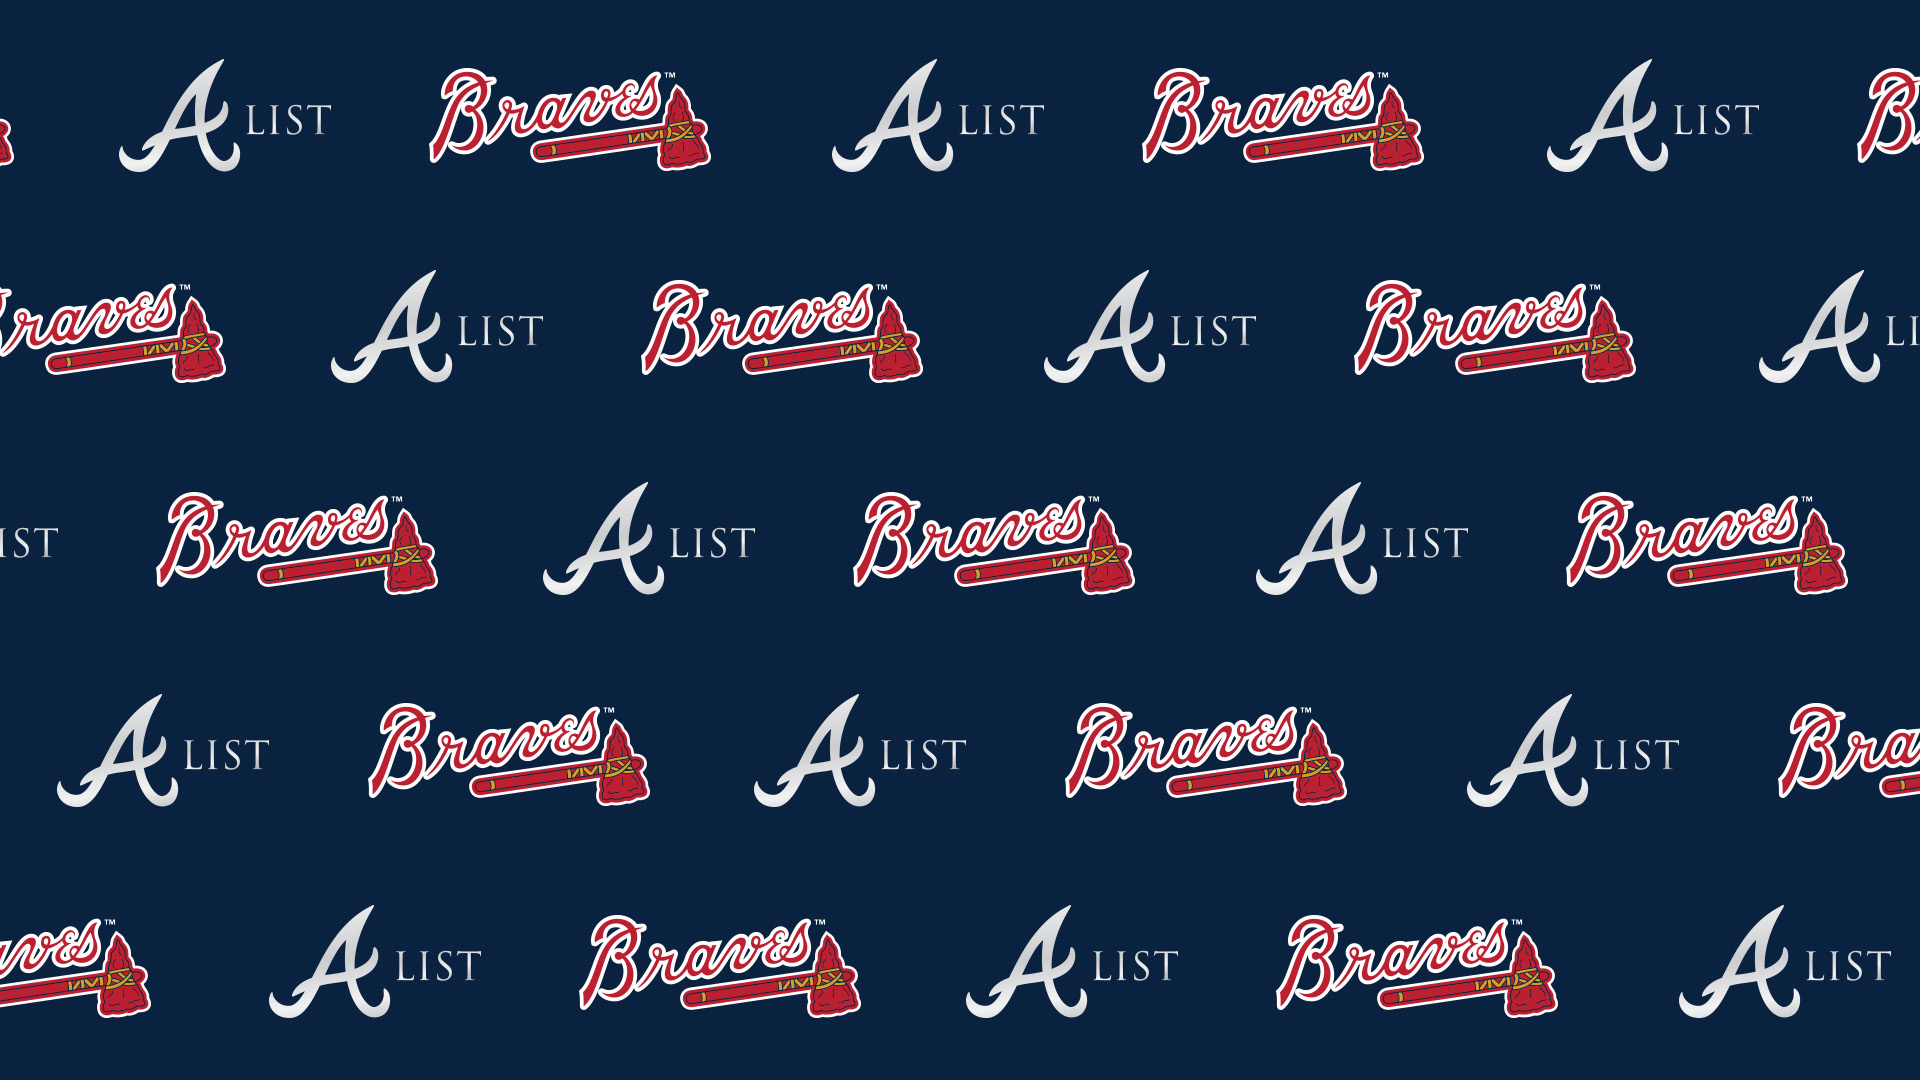 At Home Activities A List Member Atlanta Braves